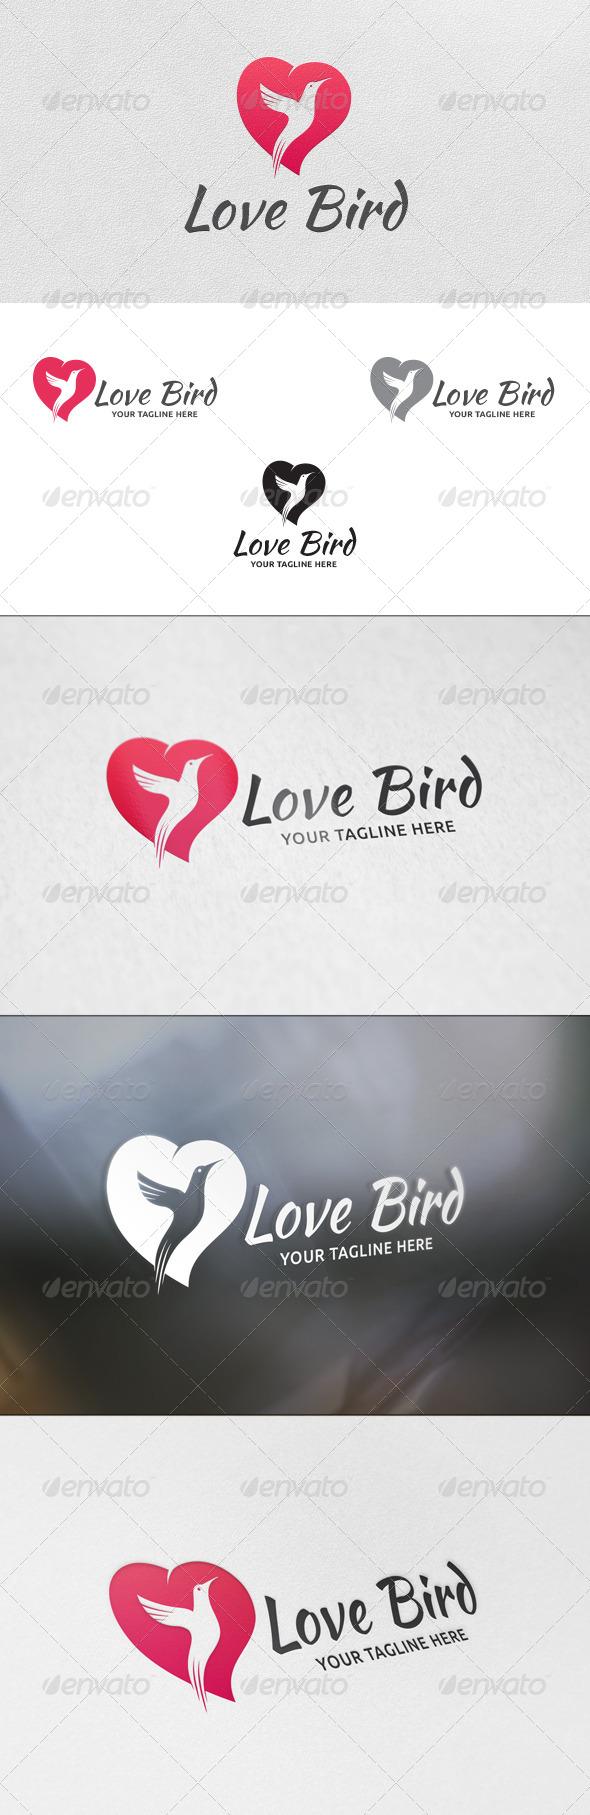 GraphicRiver Love Bird Logo Template 5740582